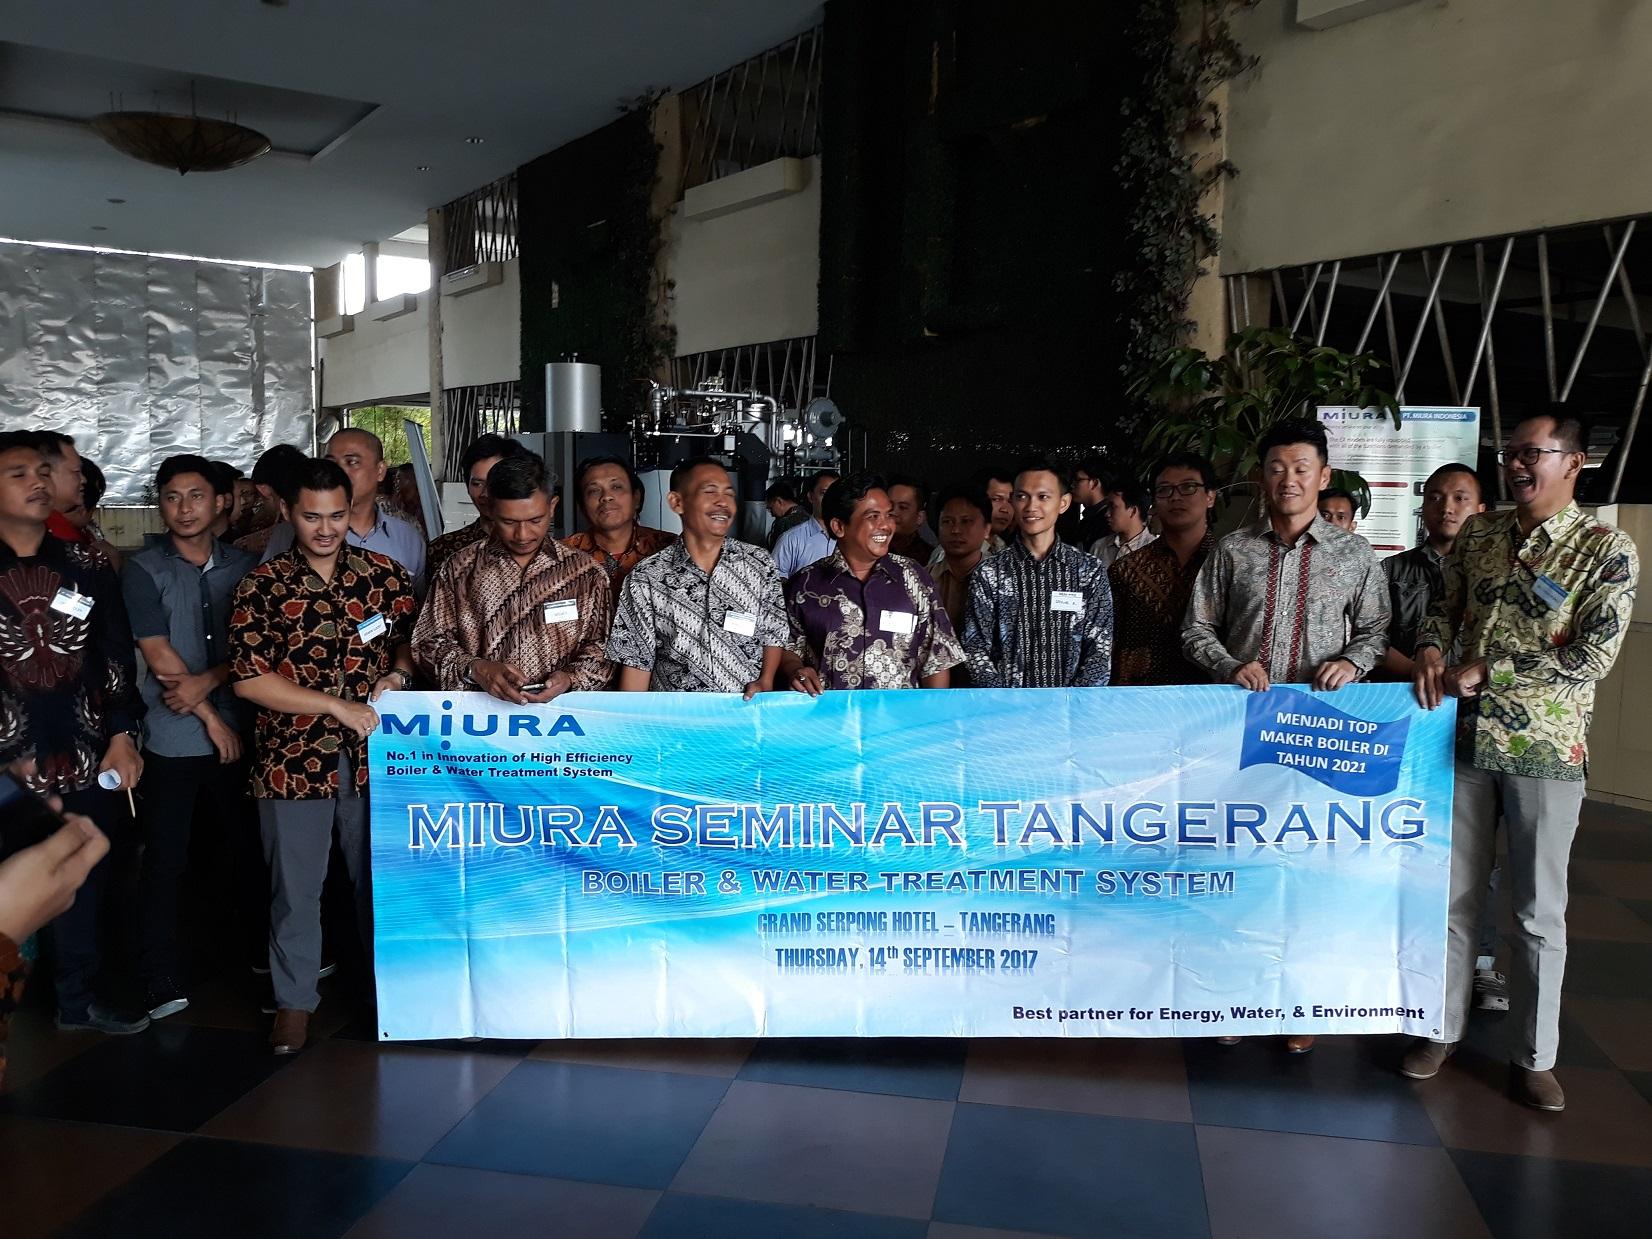 Seminar Tangerang 2017